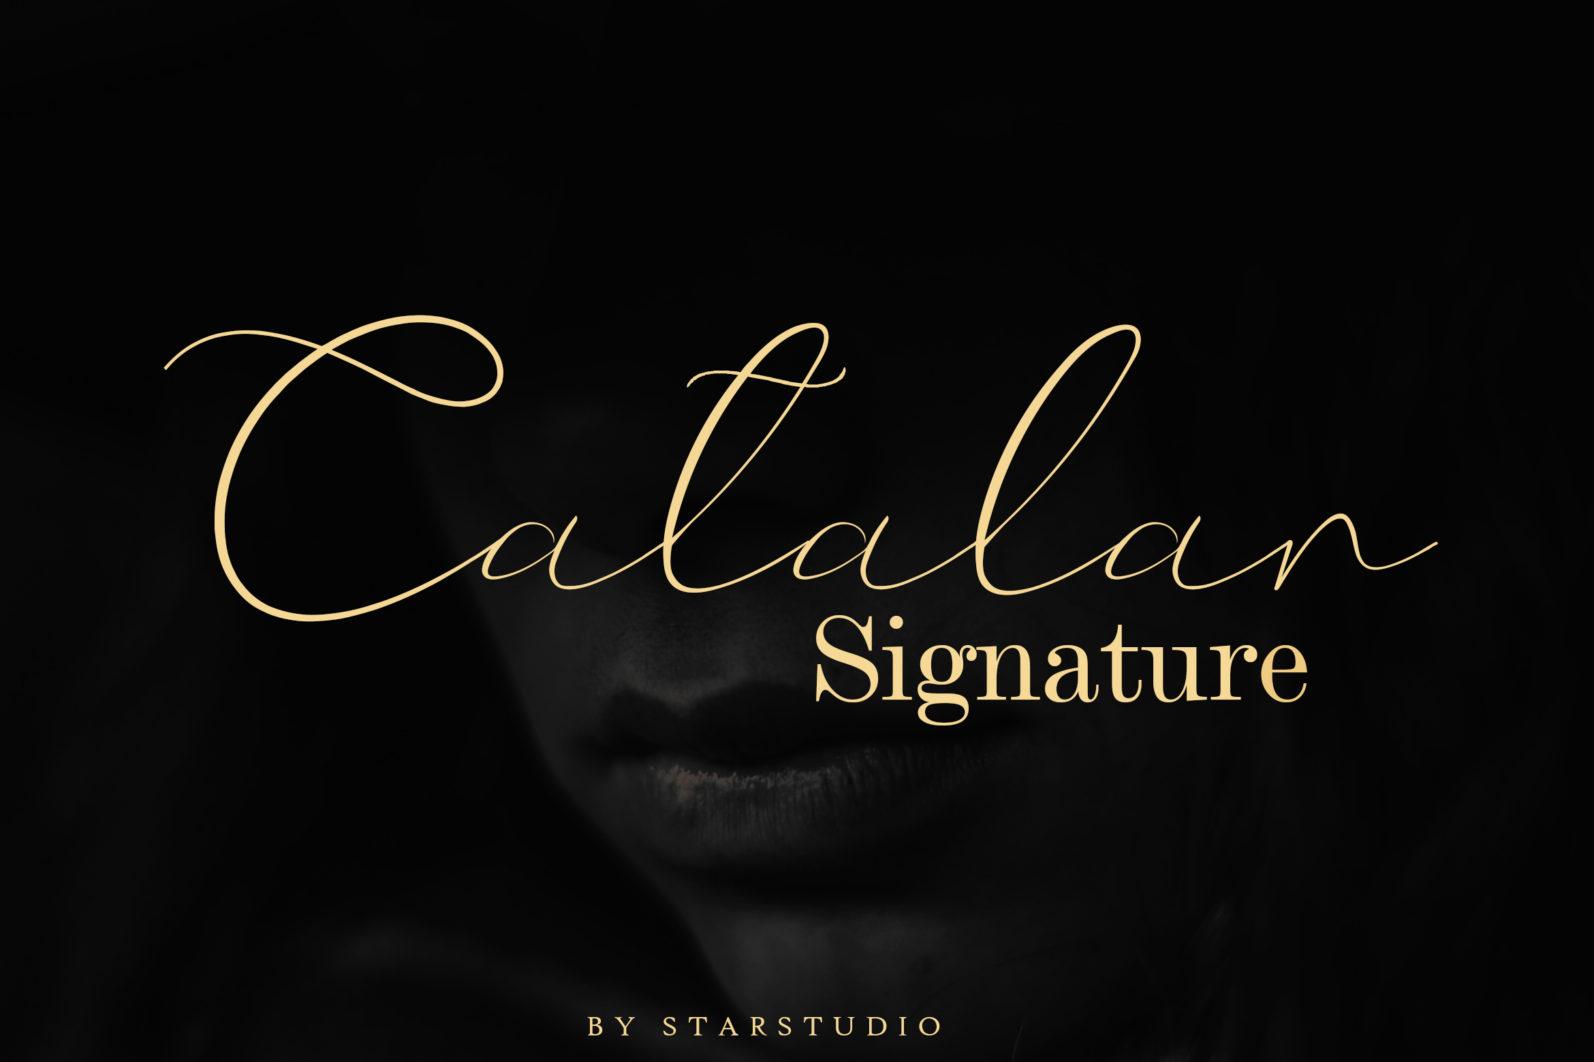 Catalan Signature font - 1188 -